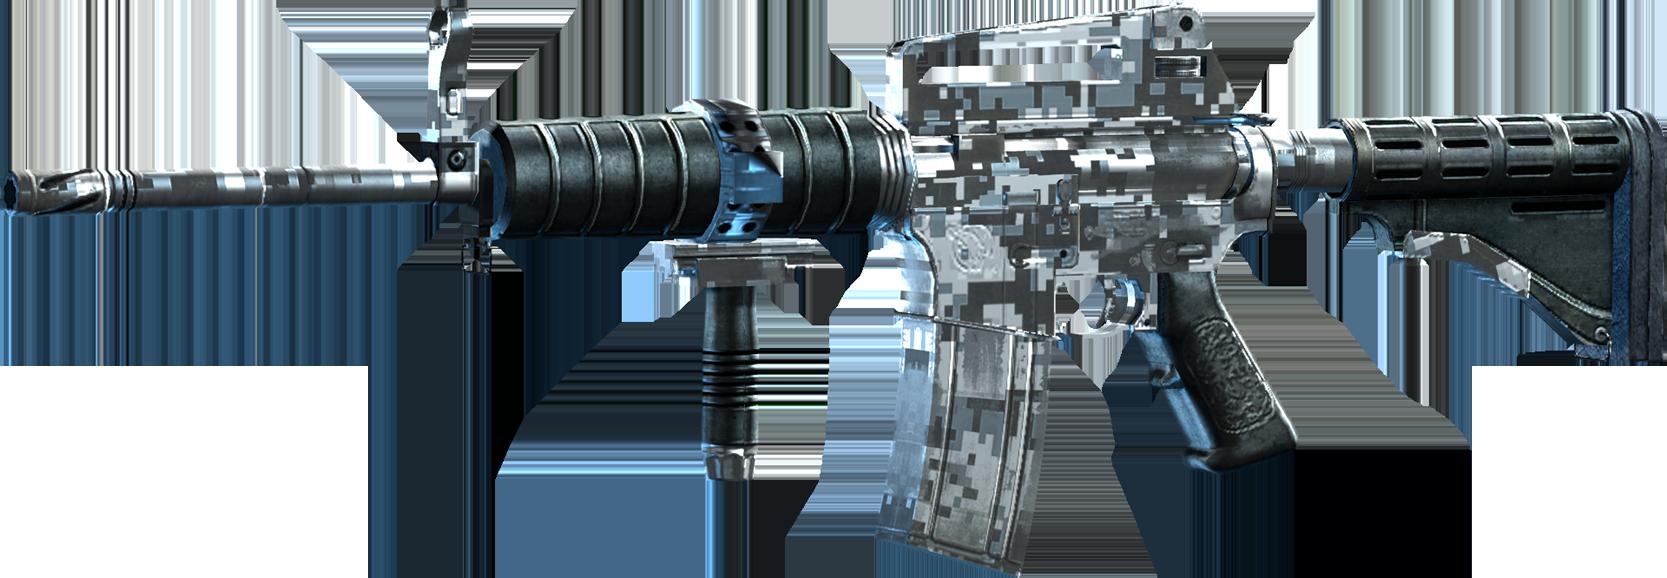 SRIV Rifles - Automatic Rifle - Shokolov AR - Digital Camo - Big Guns PNG